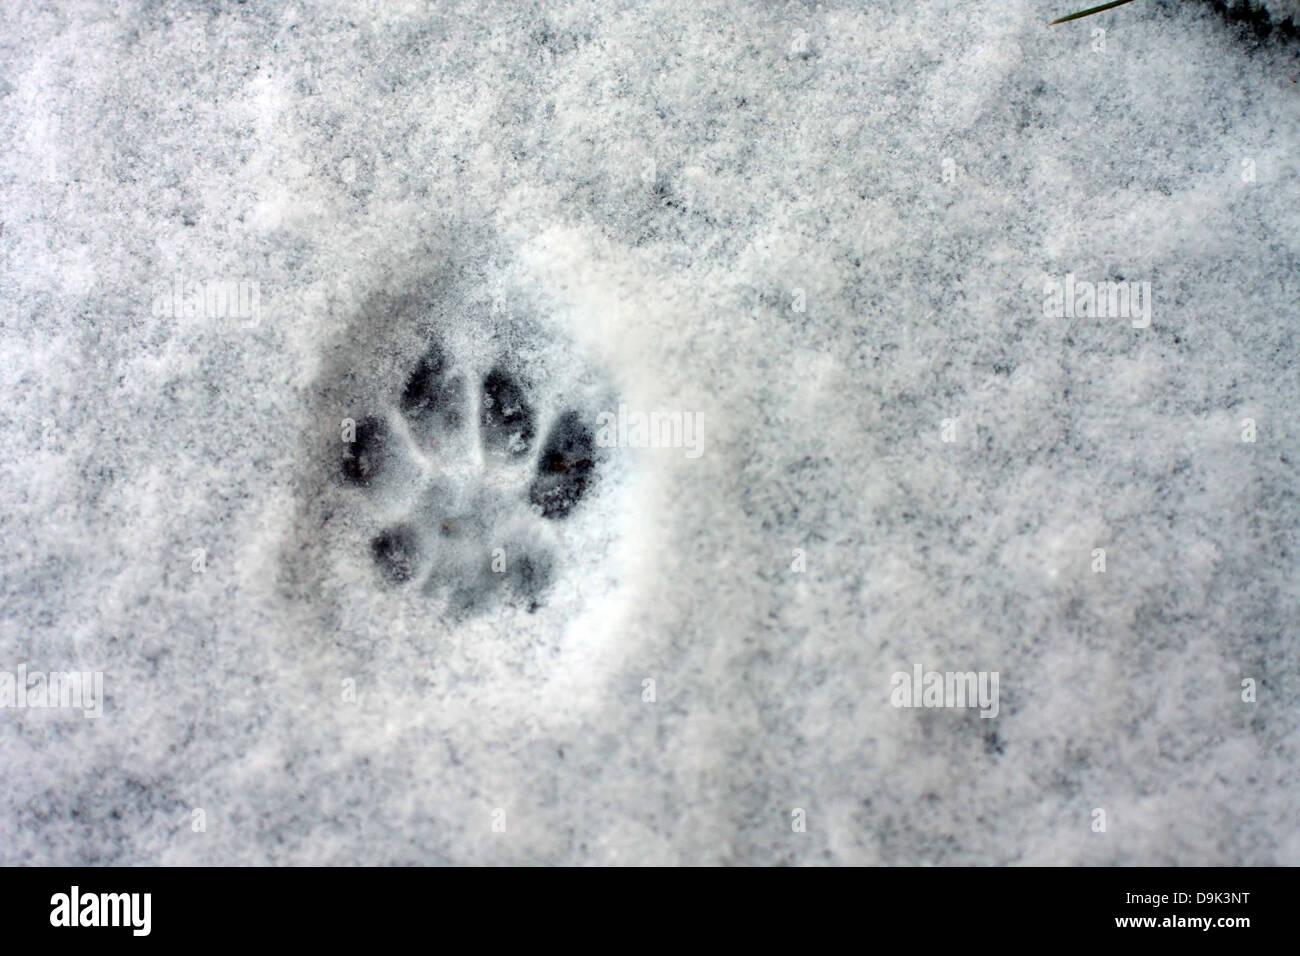 snow winter cold footprint foot print paw animal dog pet - Stock Image